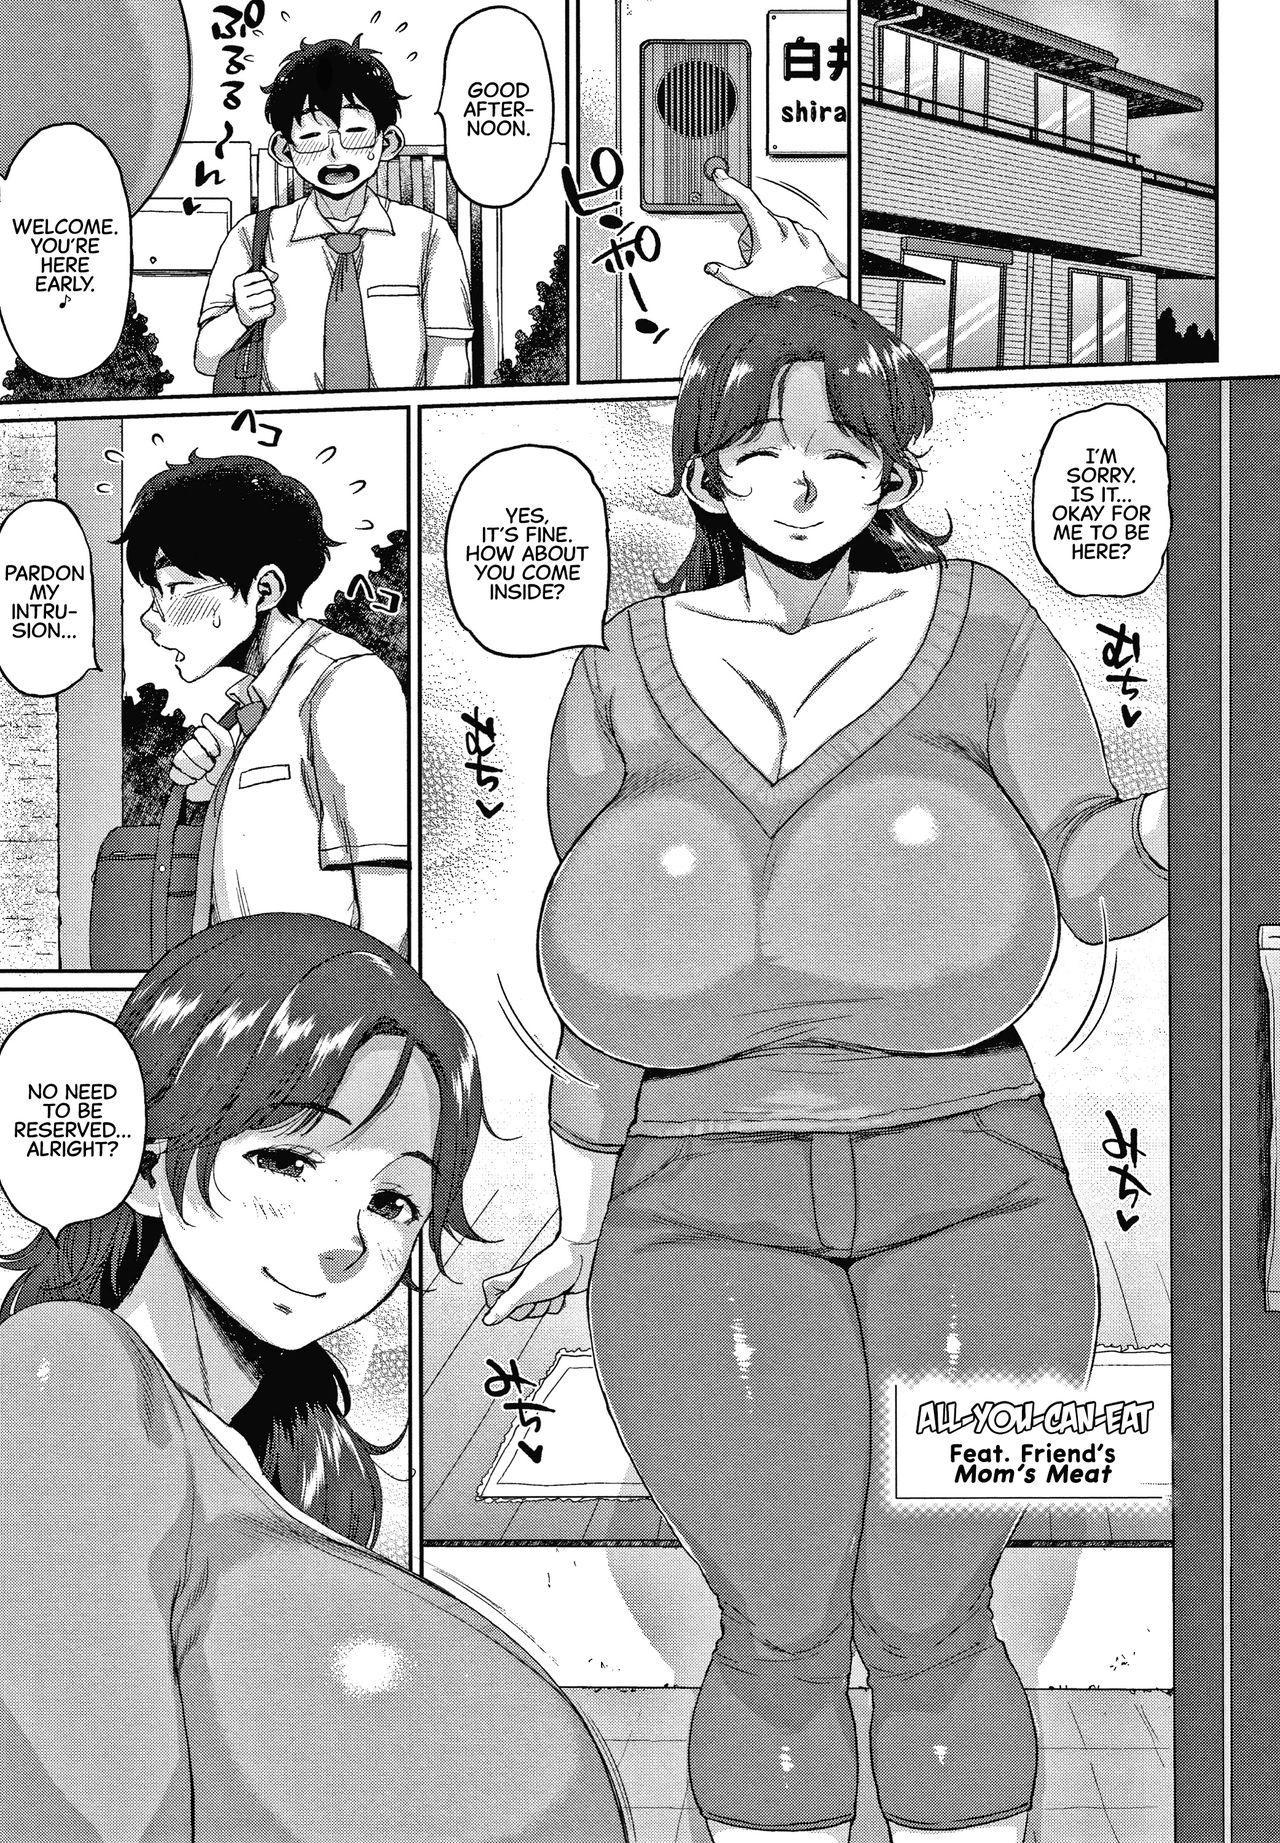 [Muronaga Chaashuu] Tomohaha Nikushoku Baikingu   All-You-Can-Eat Feat. Friend's Mom's Meat (Kaa-san no Umoretai Karada) [English] [CulturedCommissions] 0